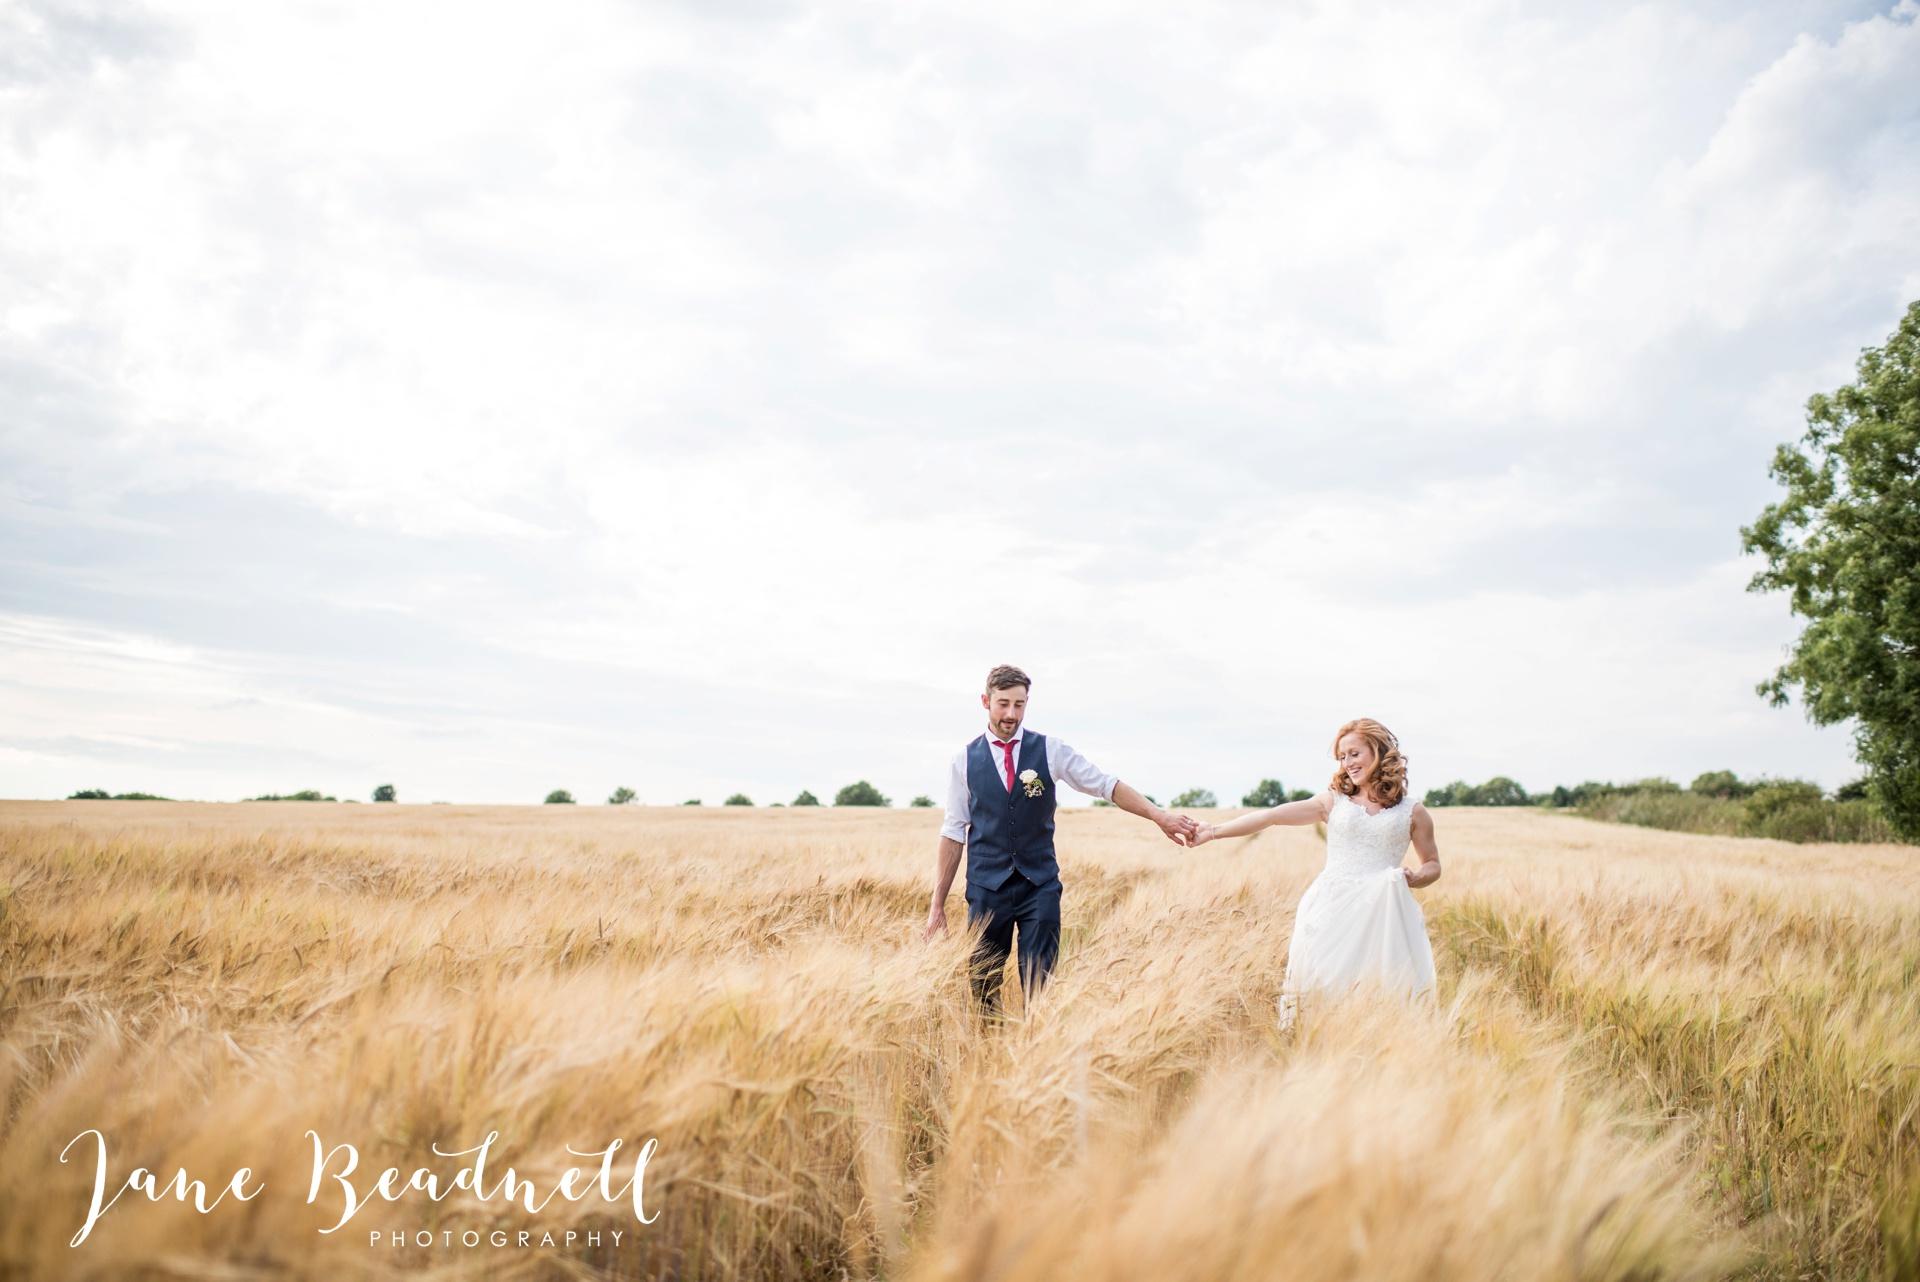 Yorkshire Wedding Photography Poppleton wedding by Jane Beadnell Photography_0015